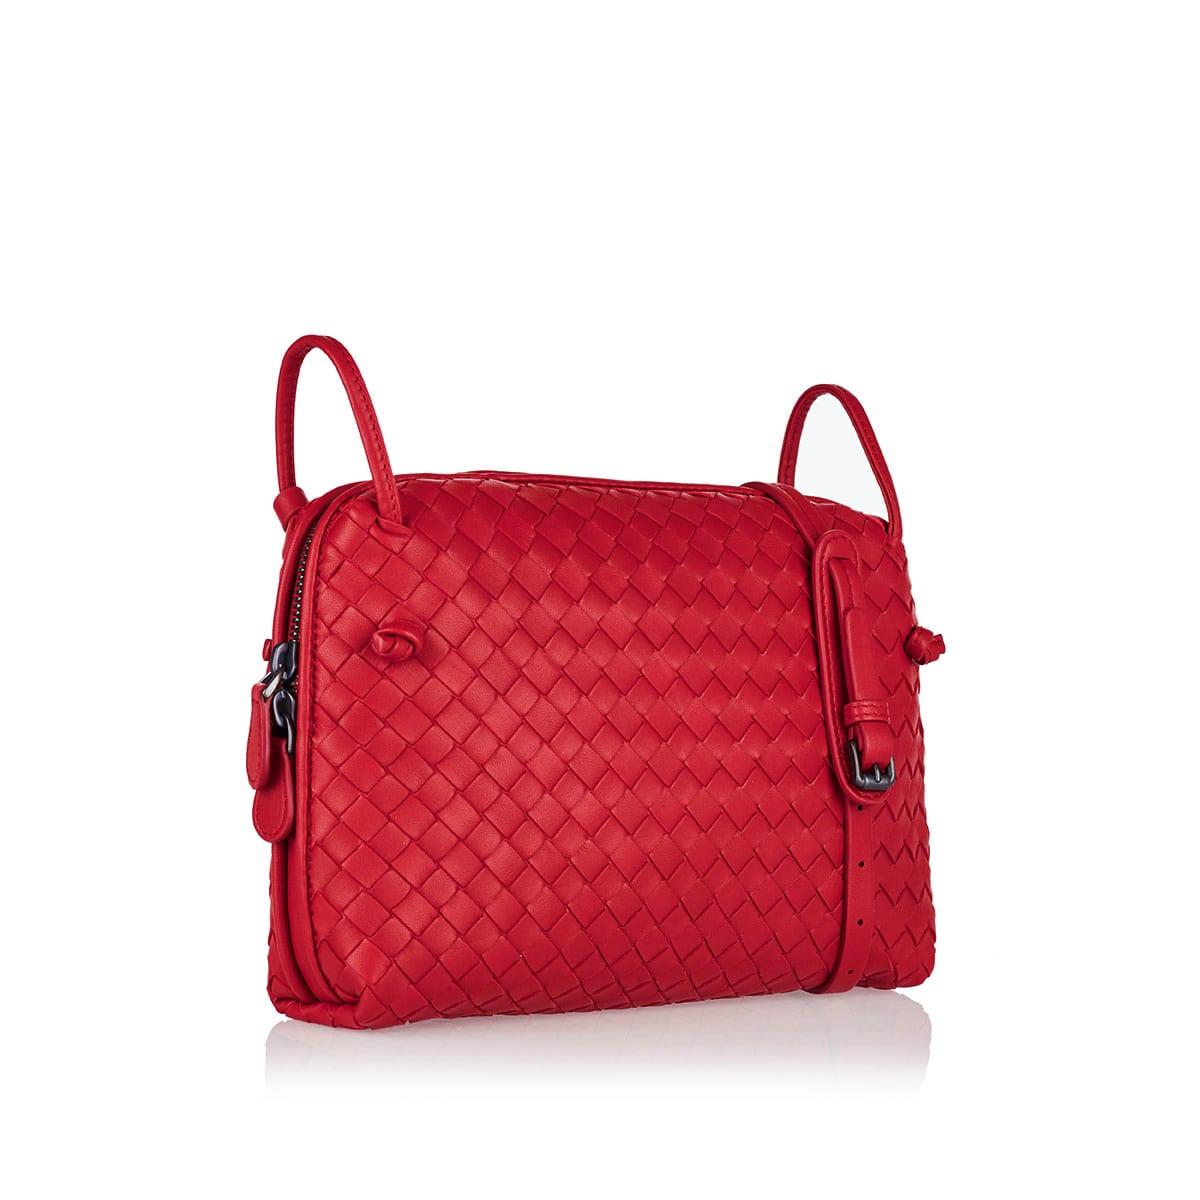 Nodini Bag